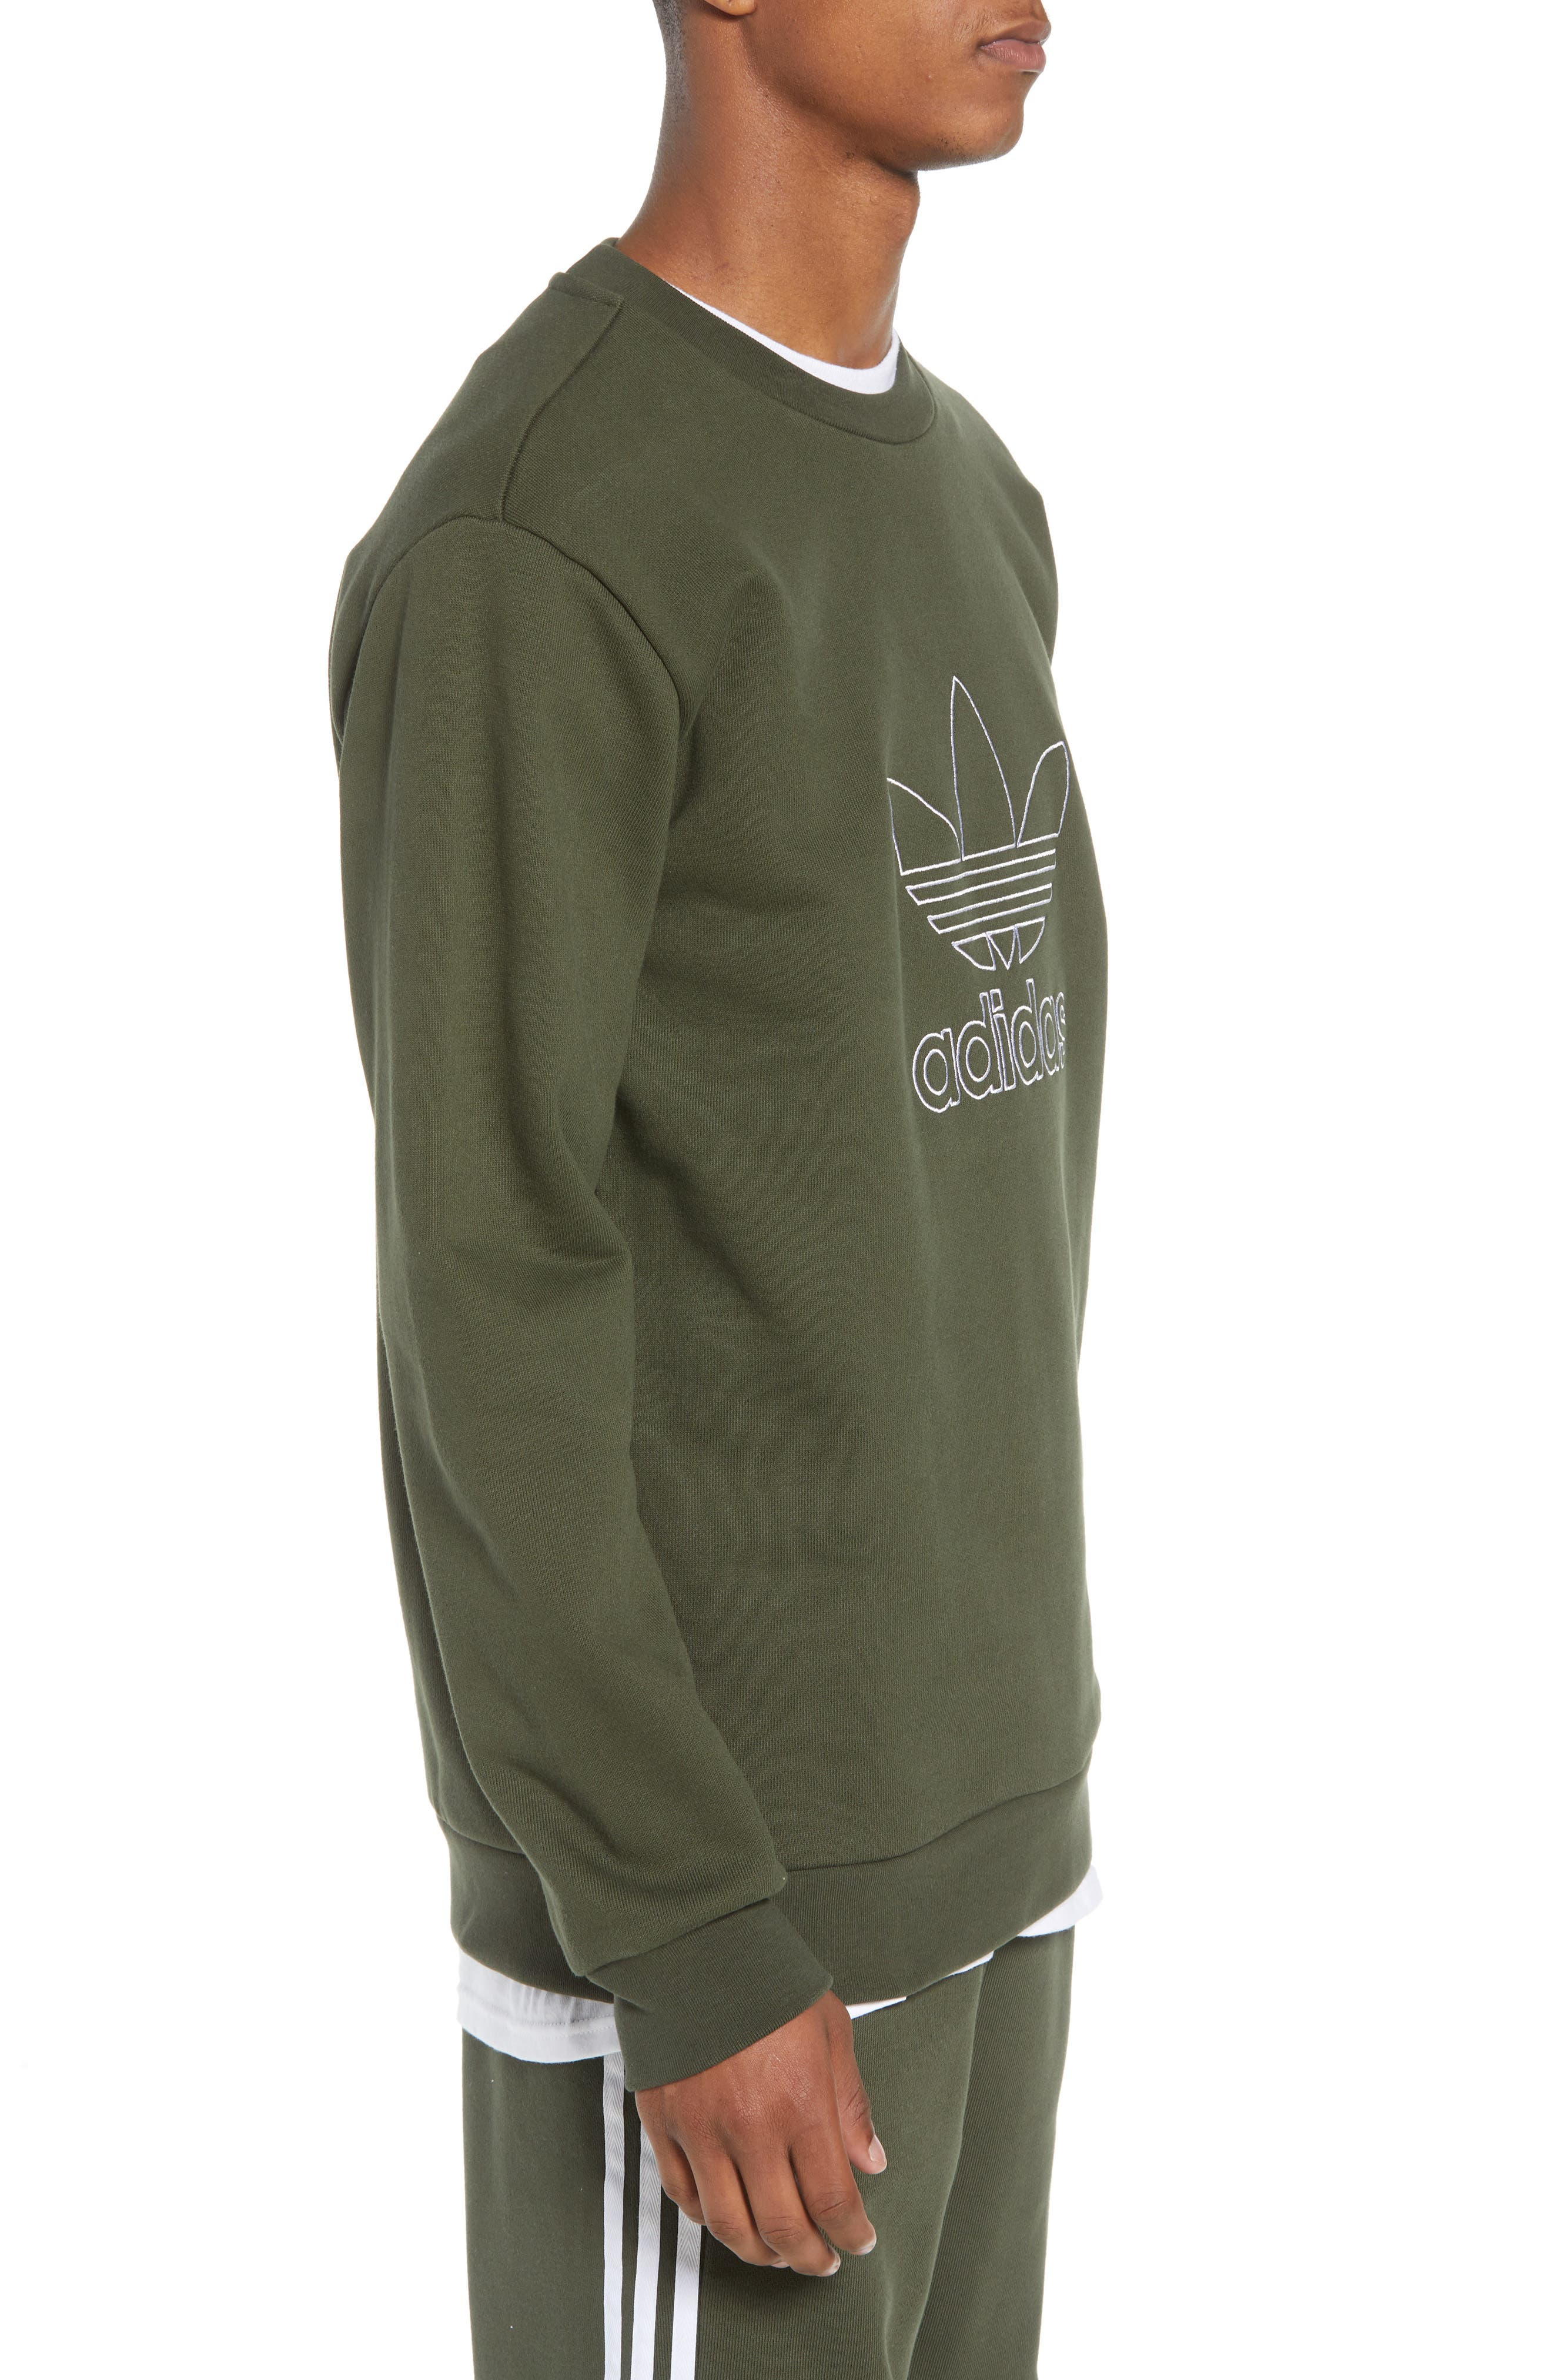 adidas Outline Trefoil Crewneck Sweatshirt,                             Alternate thumbnail 3, color,                             307